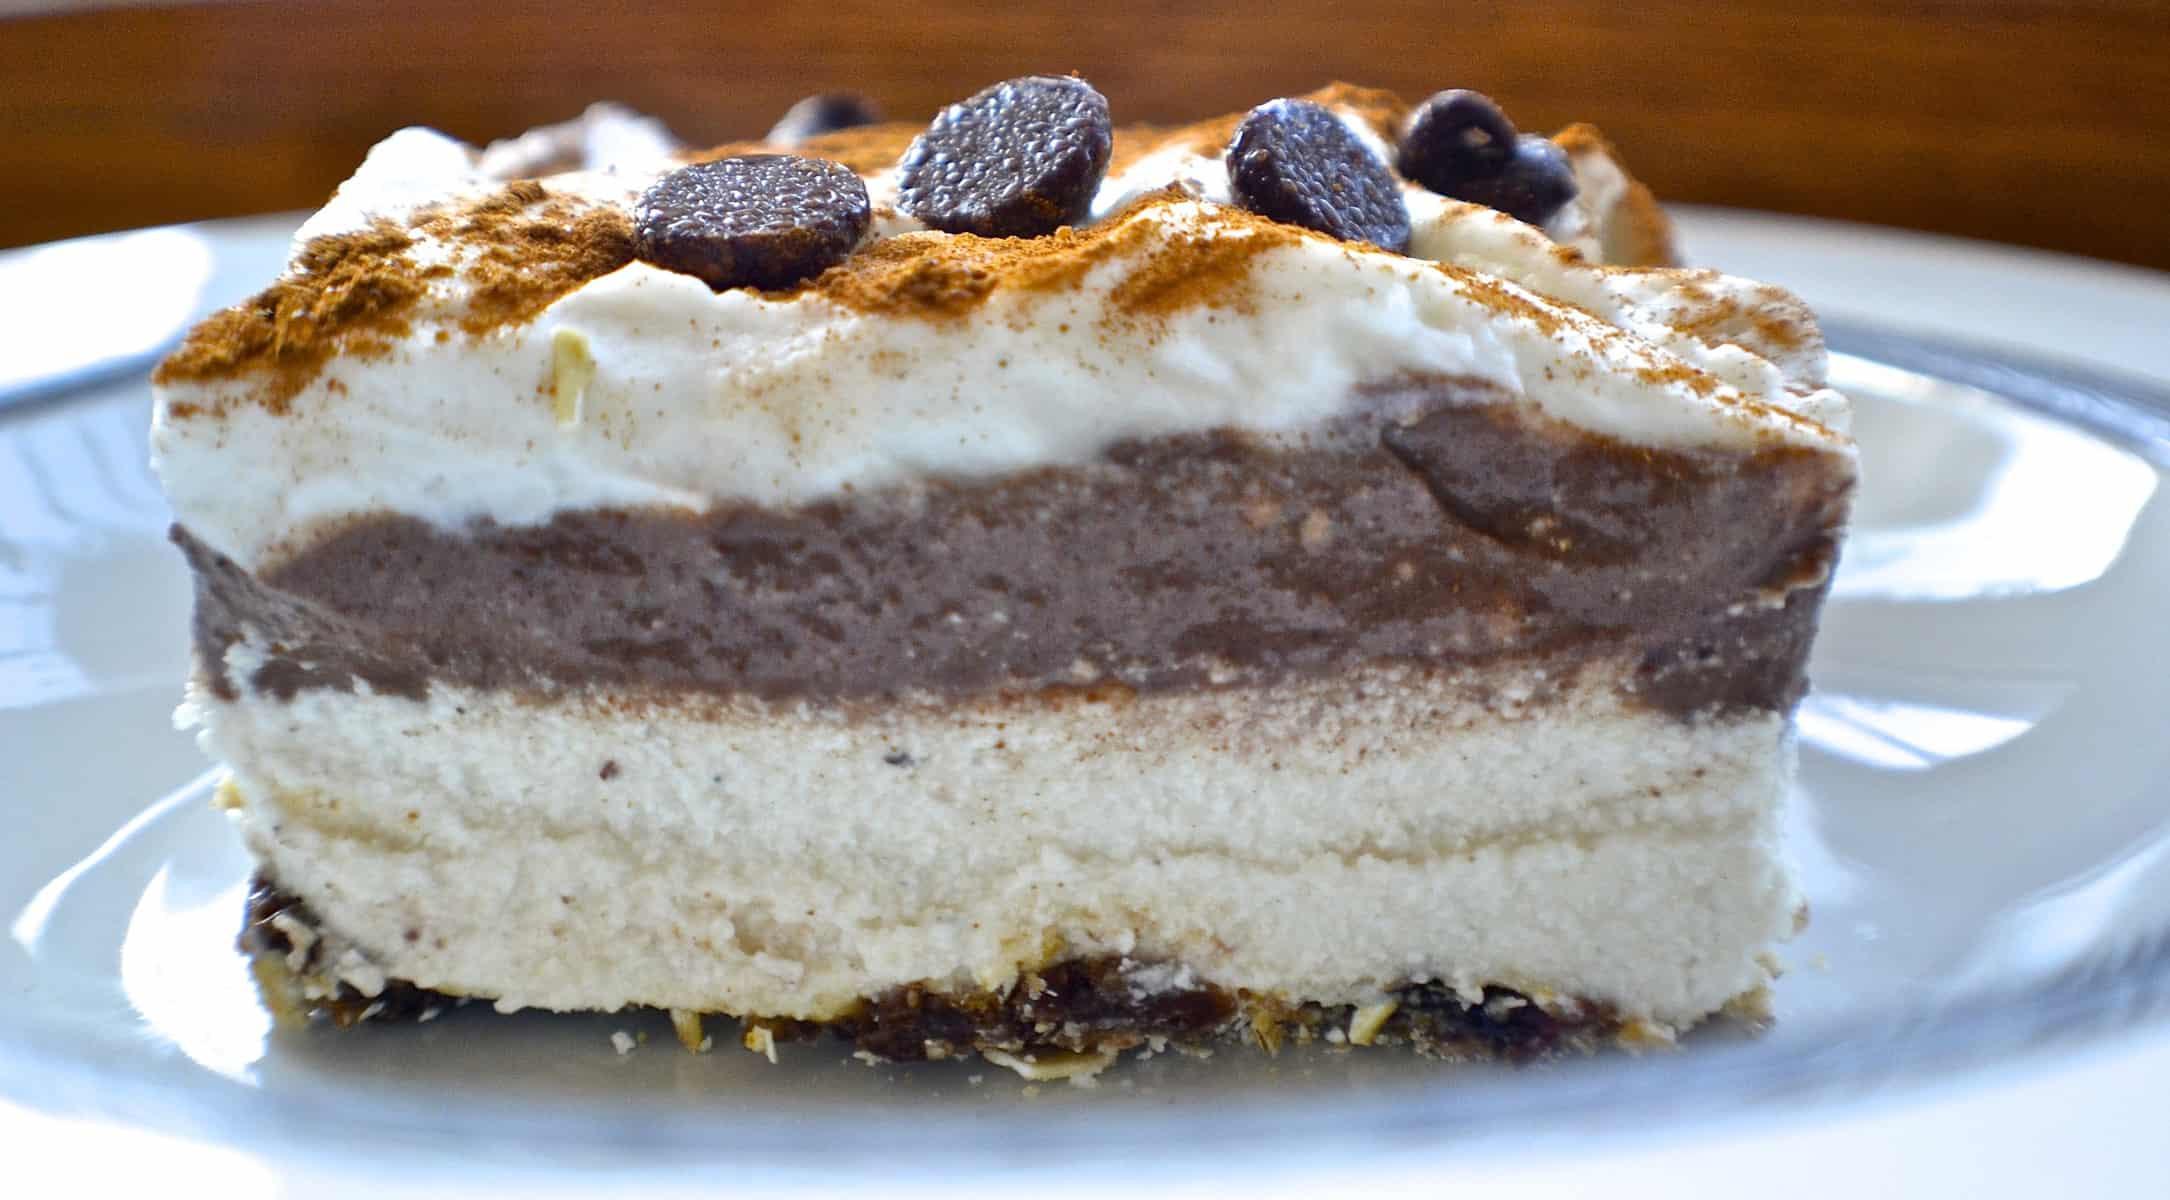 Great Dessert Recipes  The best vegan chocolate dessert recipe ever